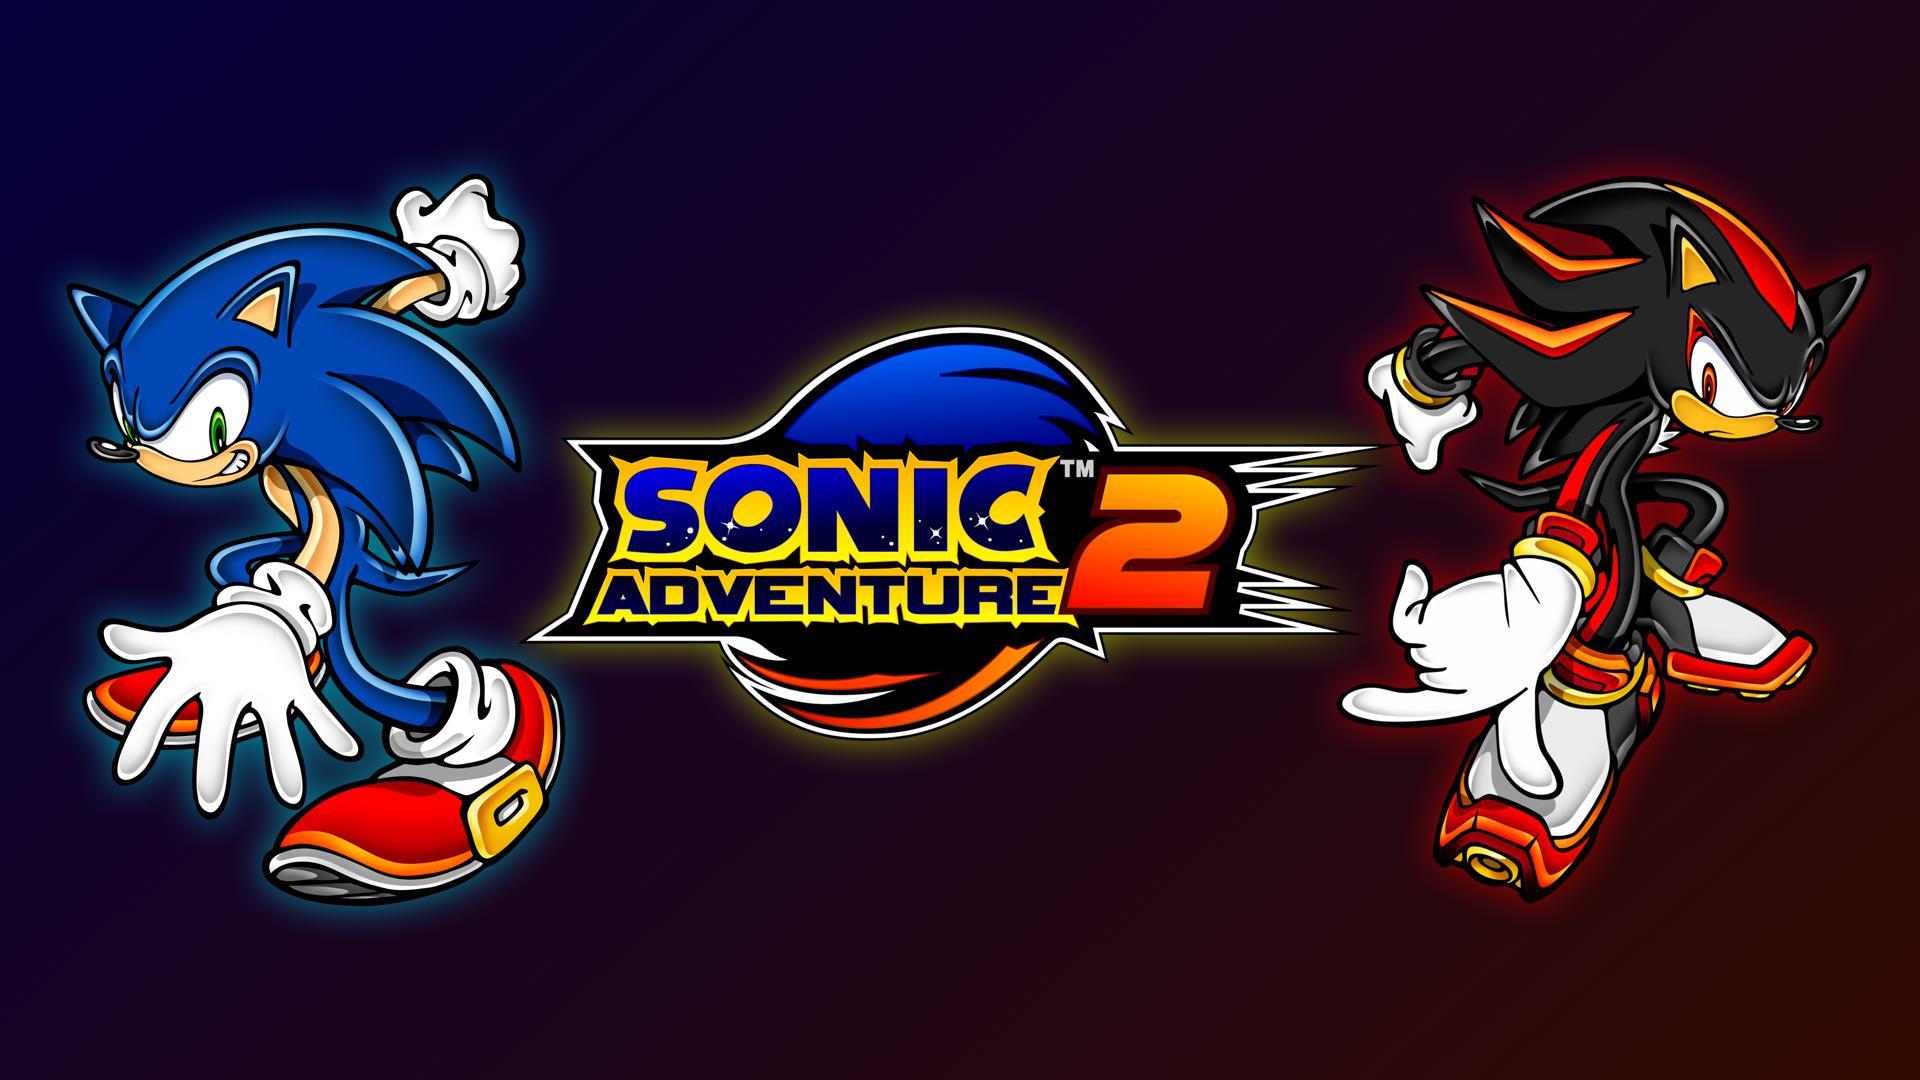 Sonic Adventure 2 Battle Wallpaper Wallpapersafari